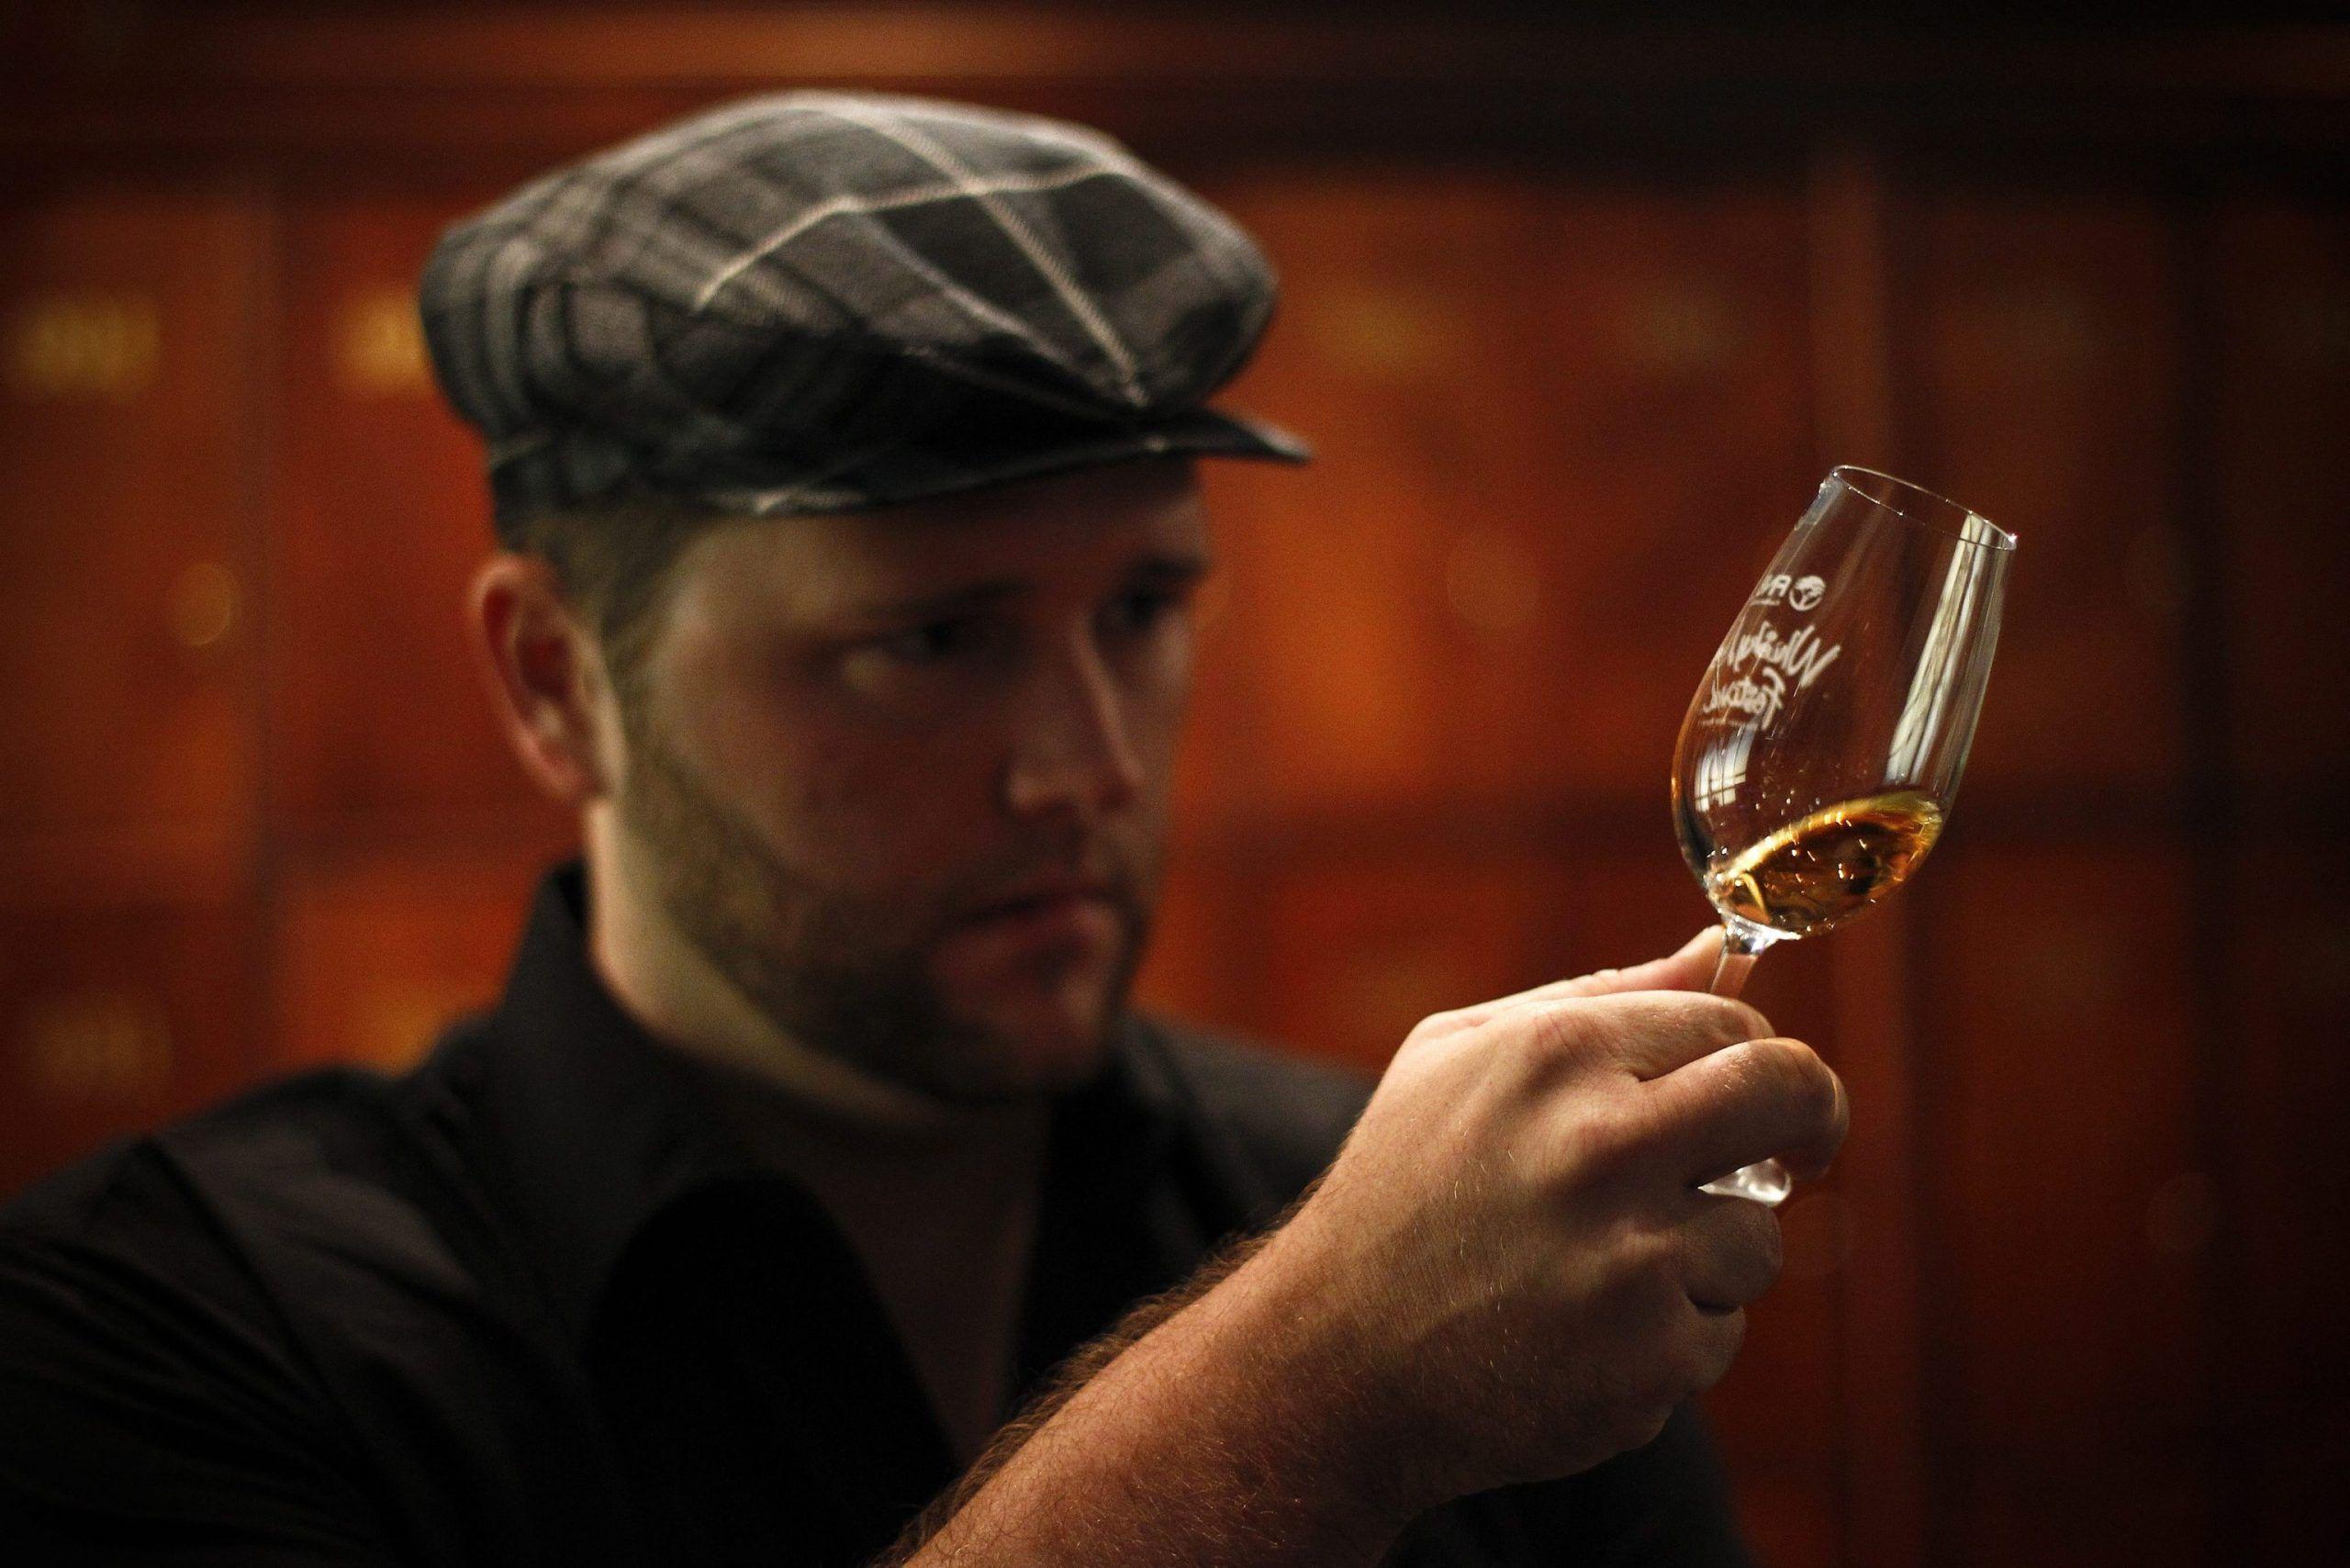 Grant's Whisky, ditta scozzese